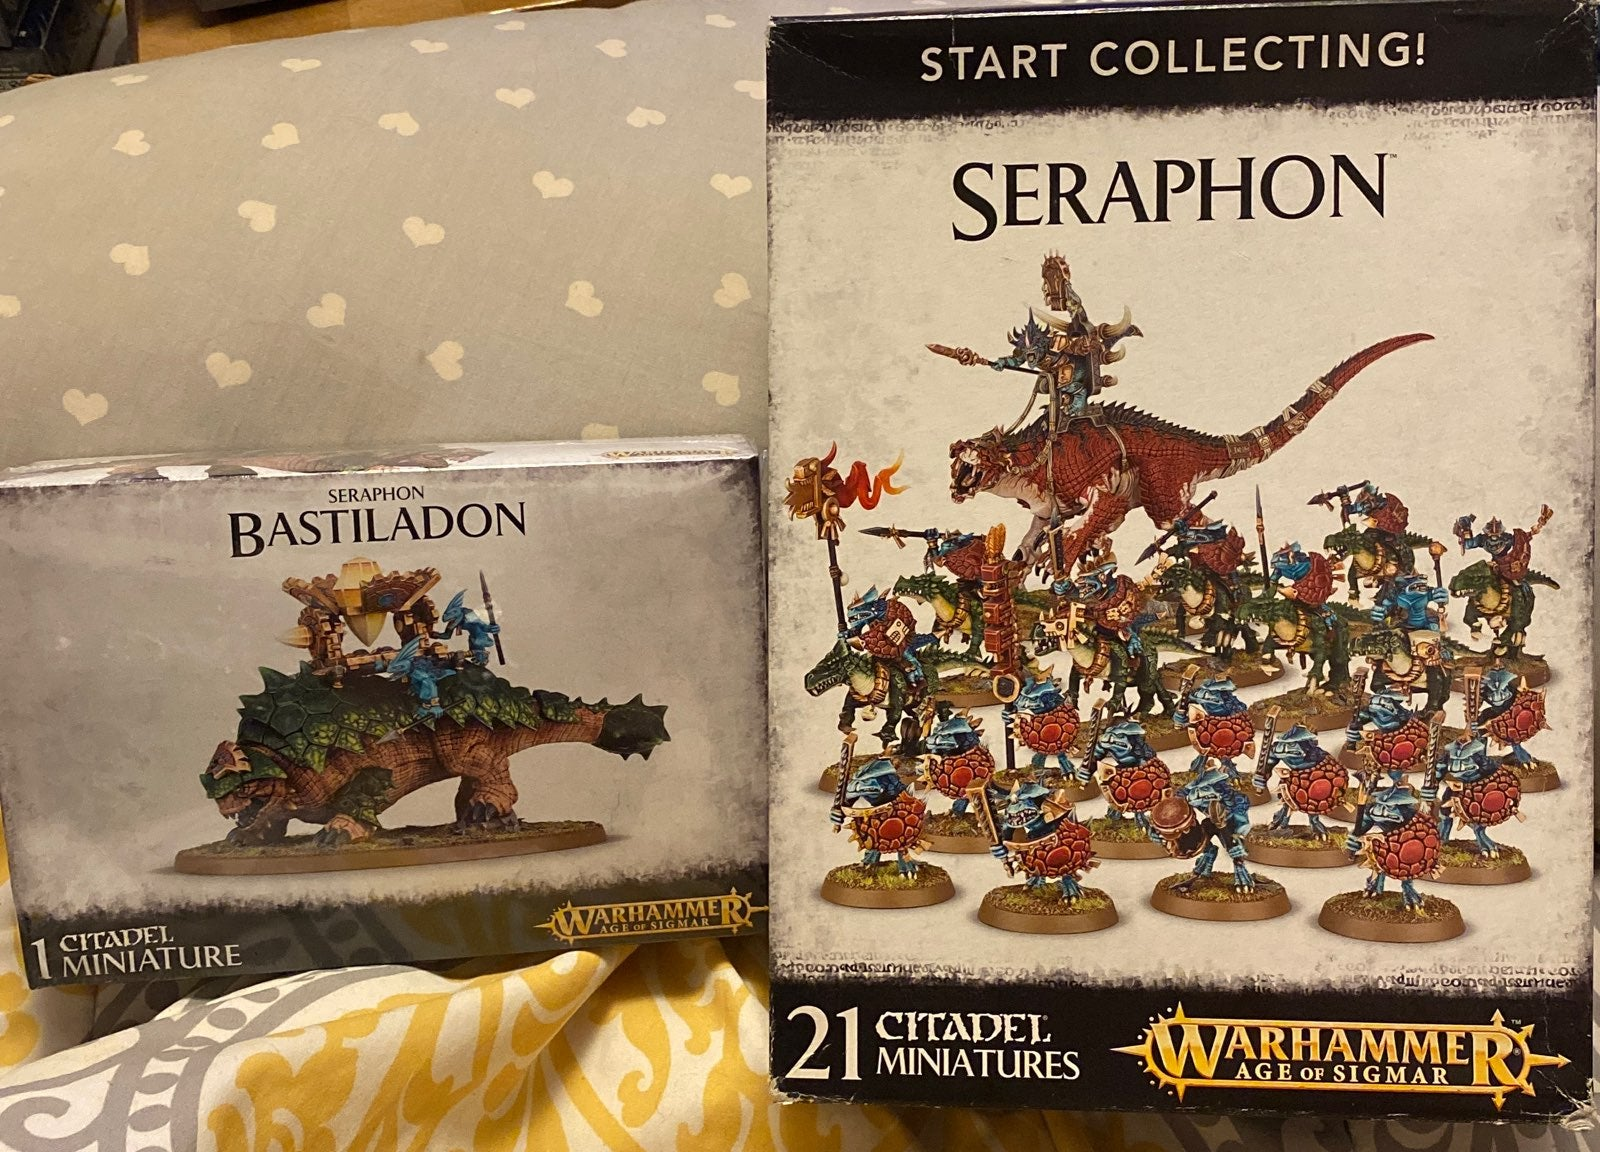 Seraphon Age of Sigmar Starter Army!